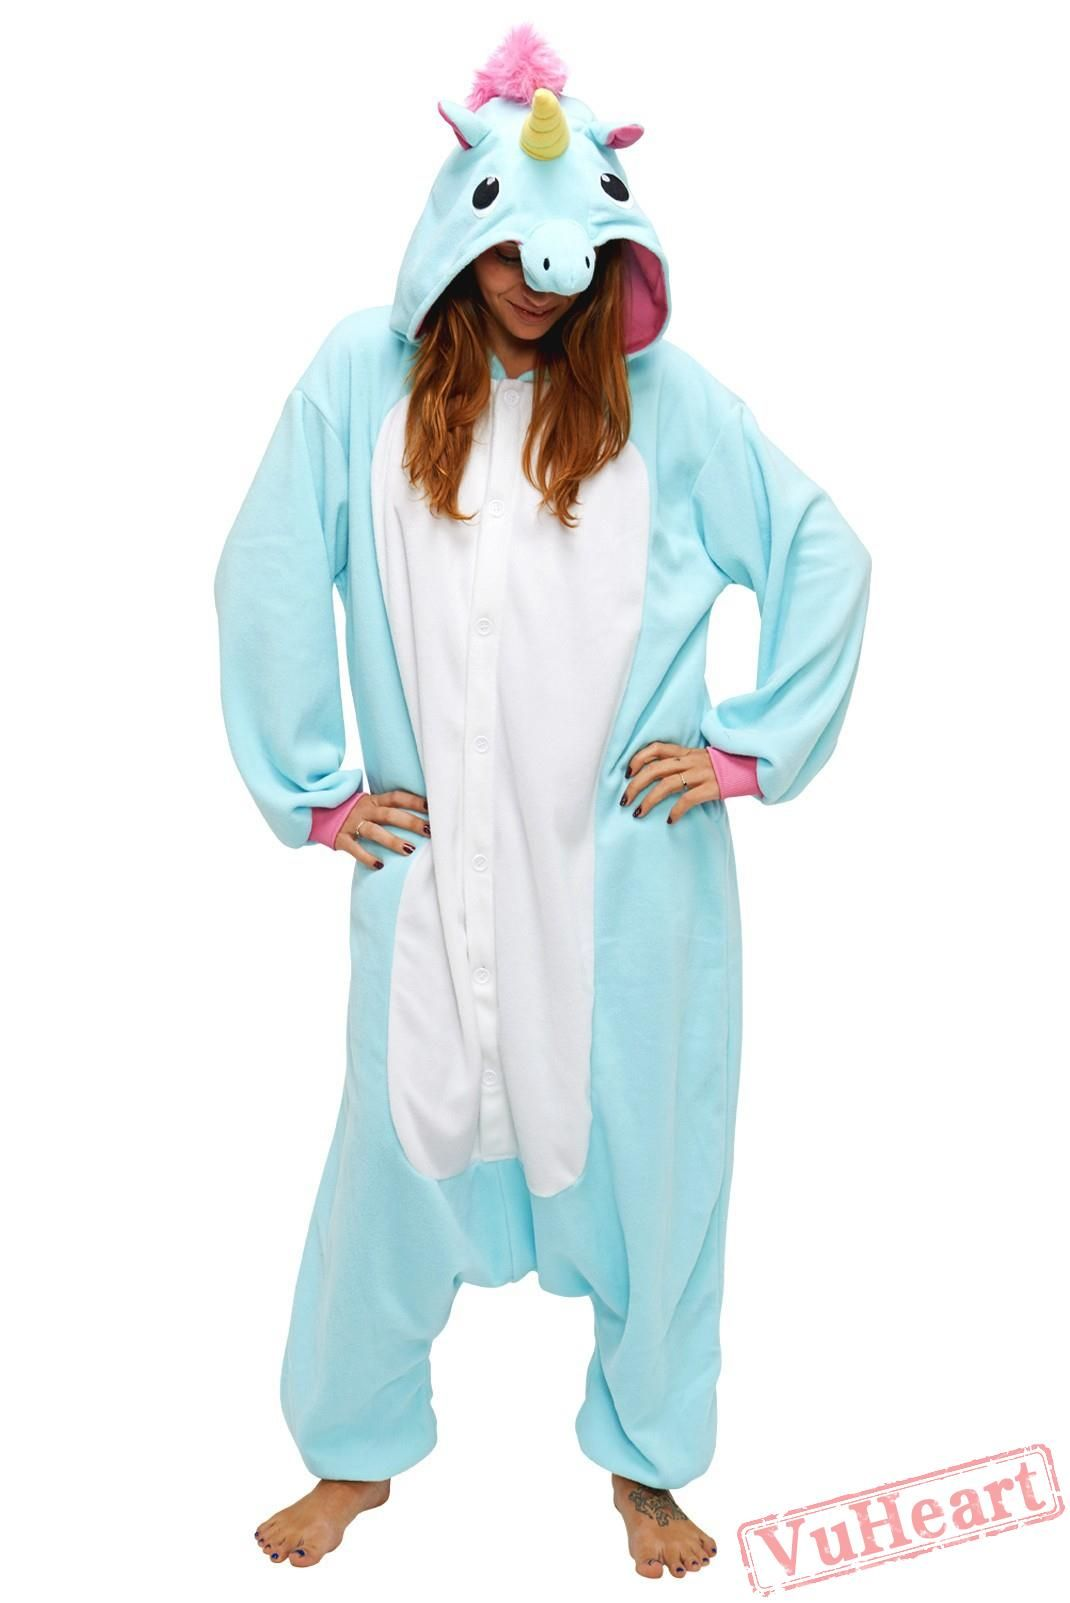 506ed7906f3f Blue Unicorn Kigurumi Onesies Pajamas Costumes for Women   Men in ...